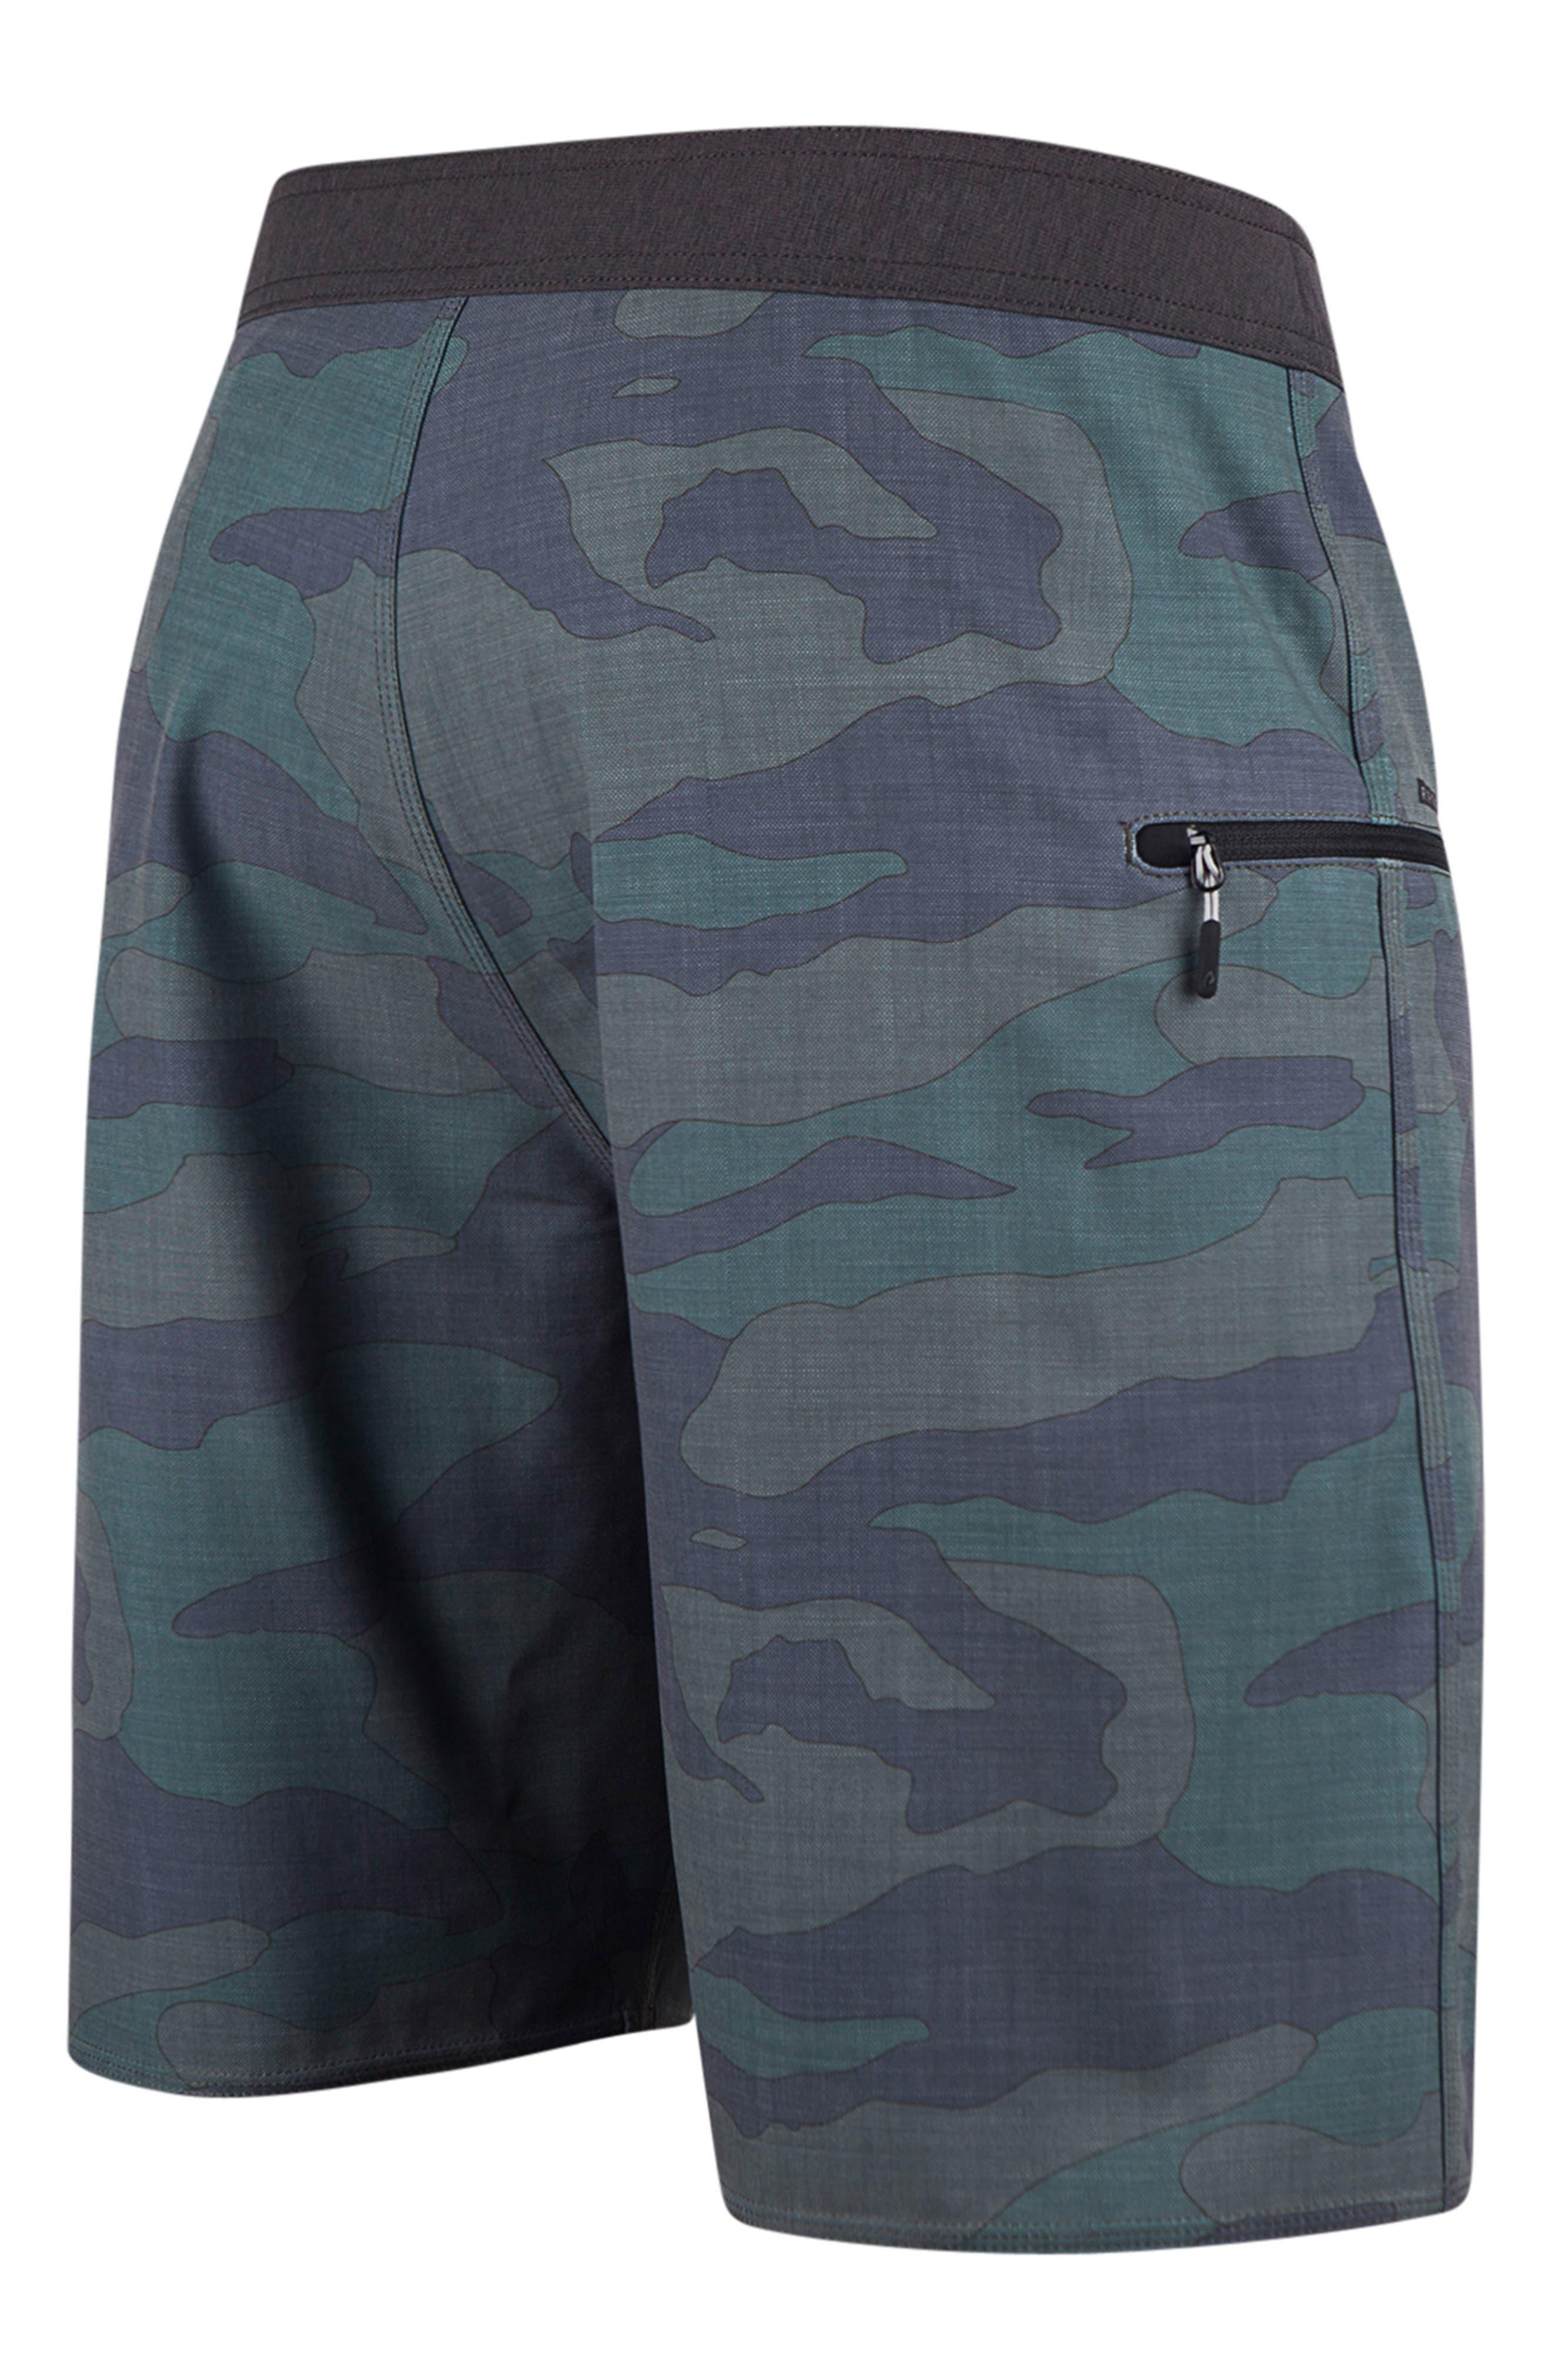 Mirage Backyard Board Shorts,                             Alternate thumbnail 2, color,                             Camo